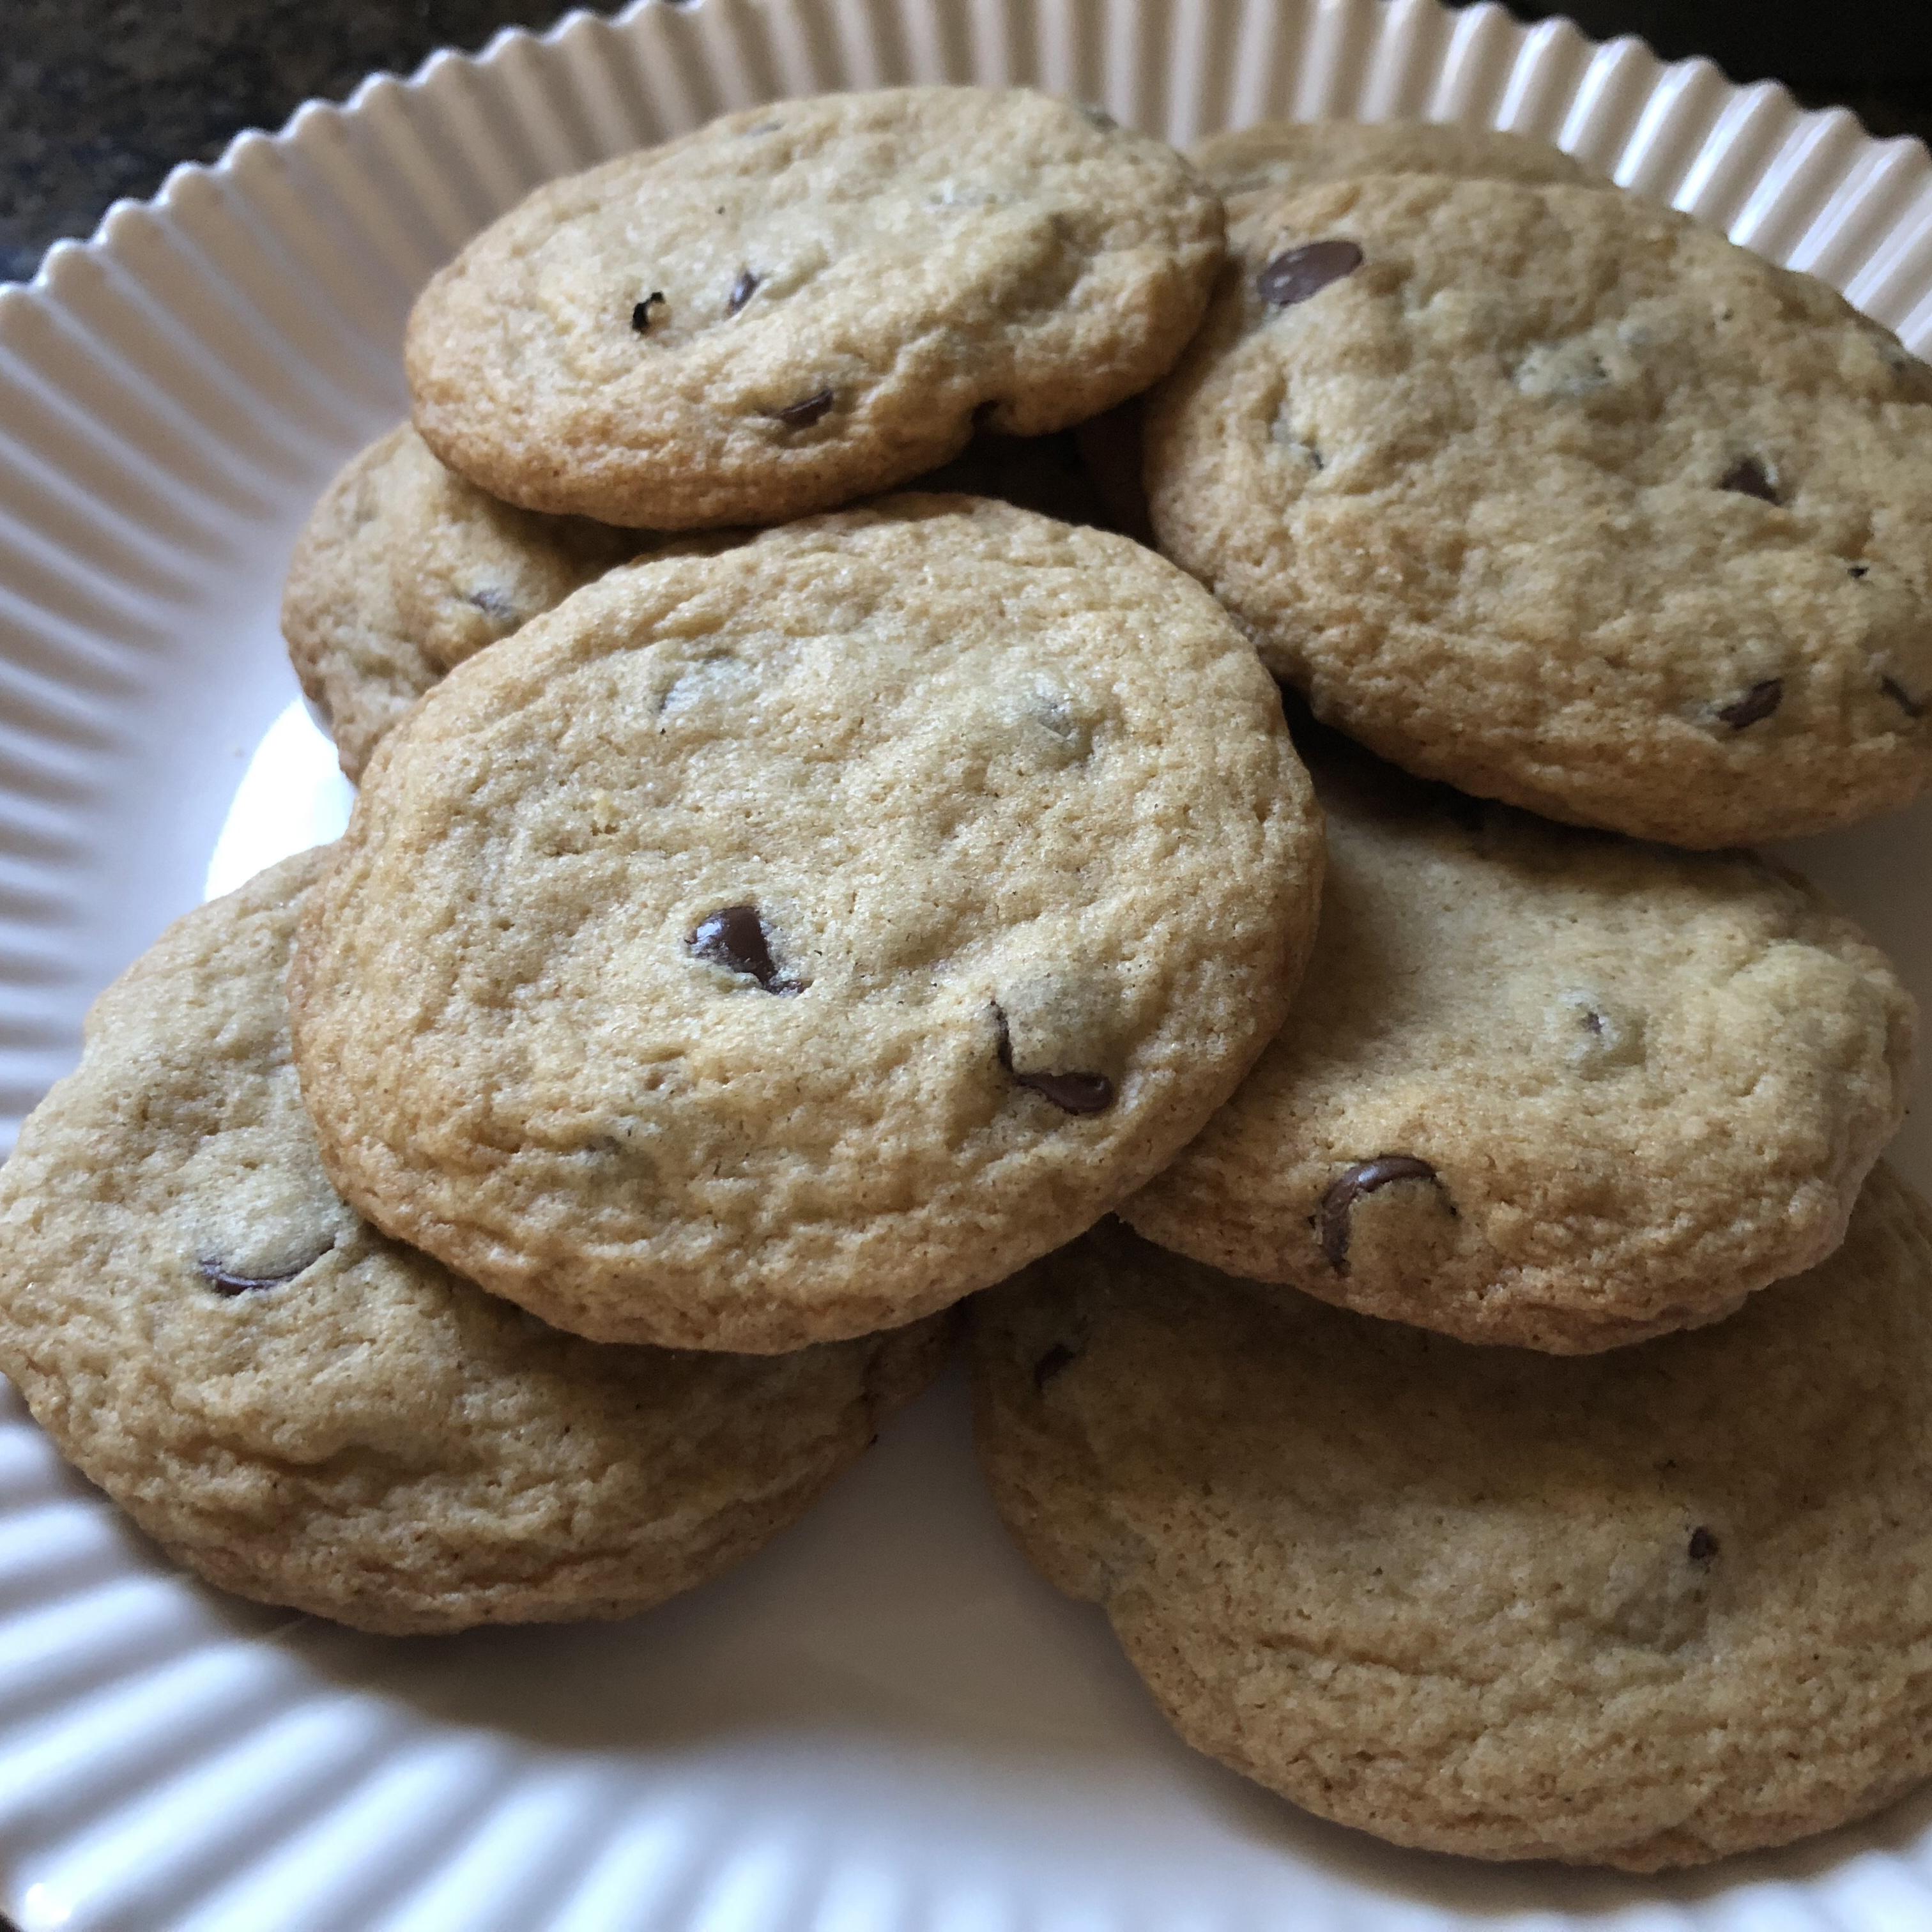 Chocolate Chip Cookies (Gluten Free) jbee70